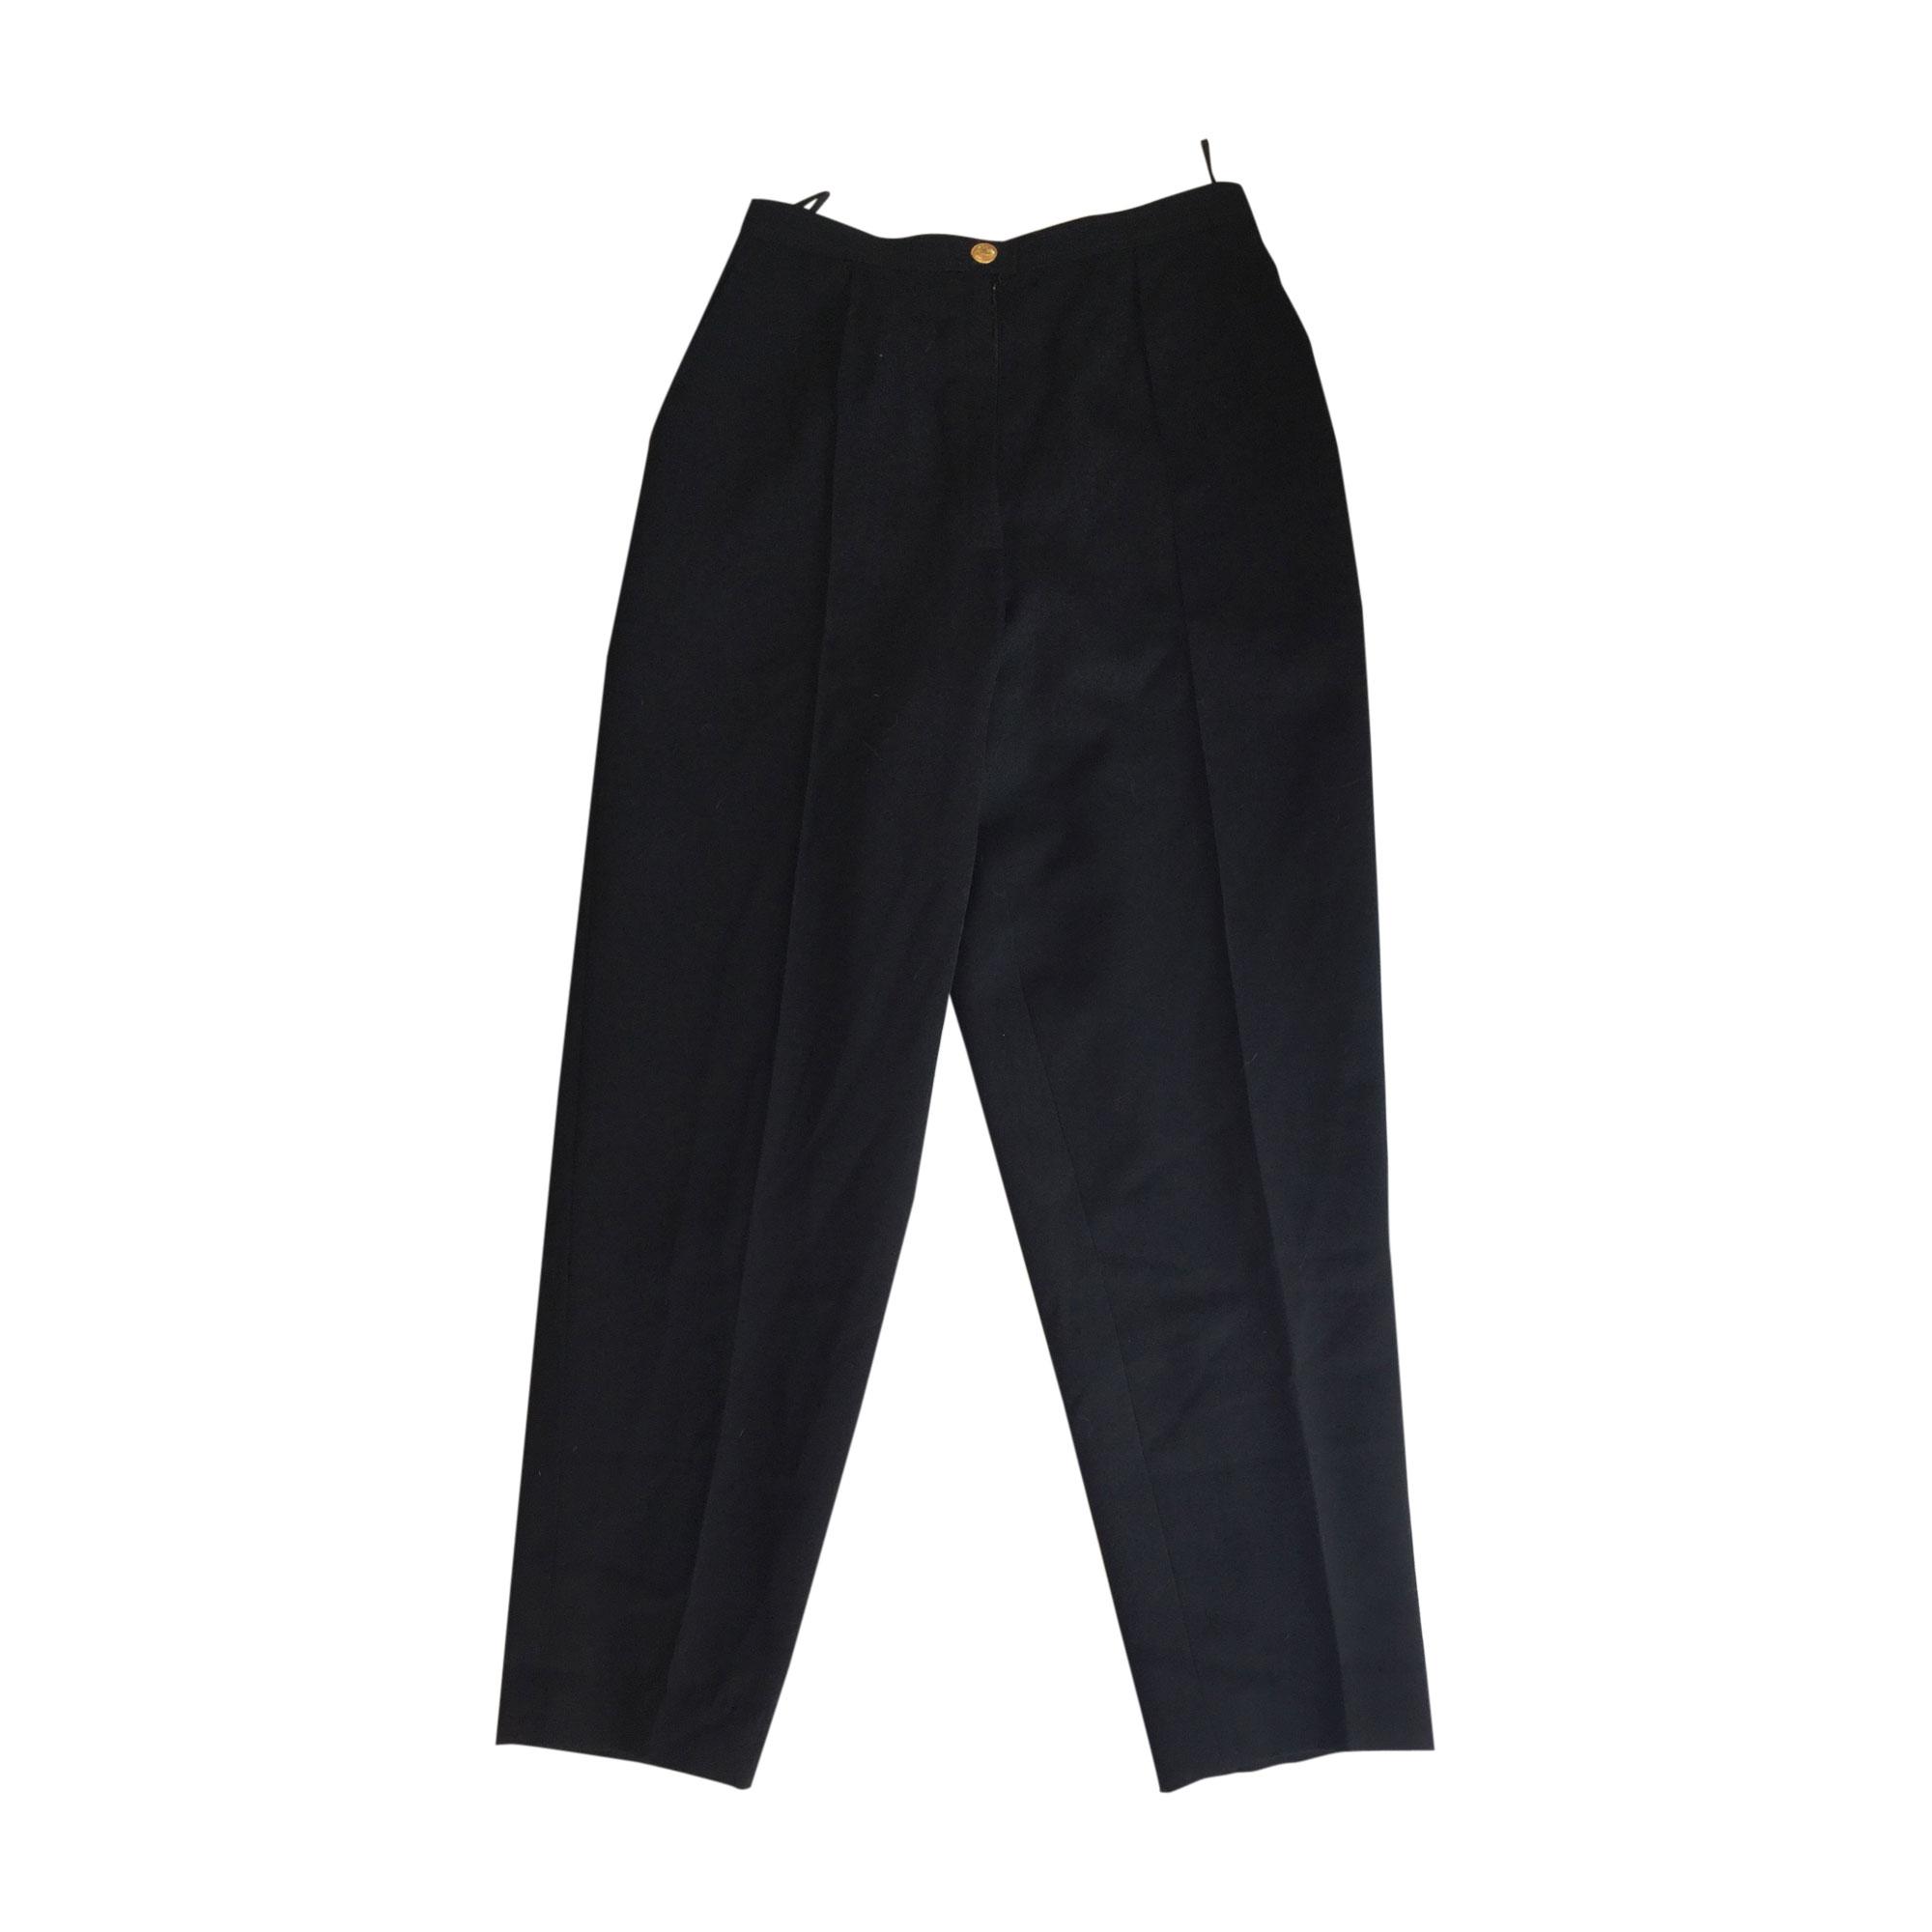 Straight Leg Pants CHANEL Black